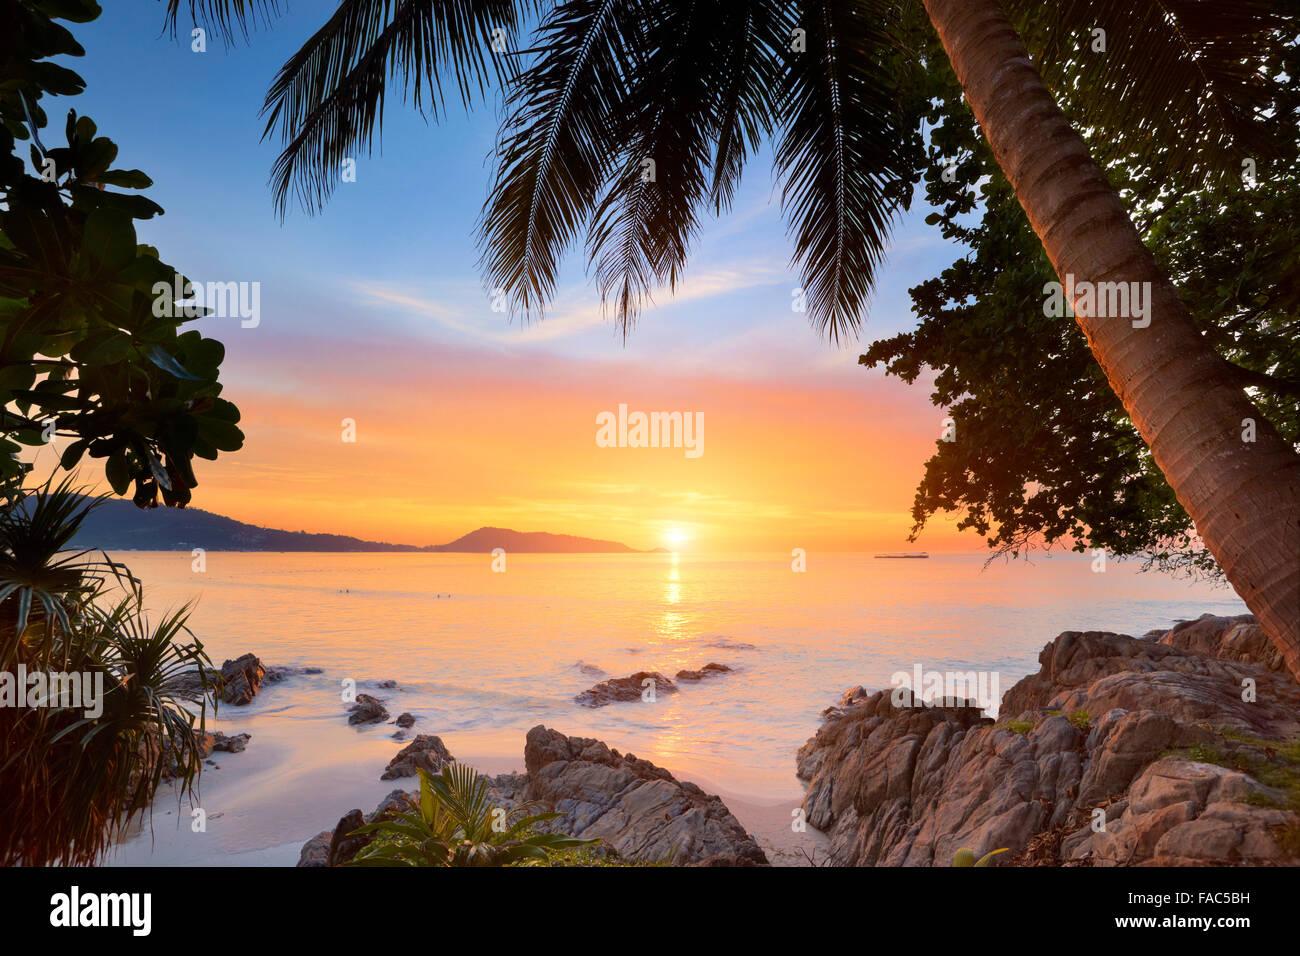 Tailandia - La isla de Phuket, Patong Beach, atardecer tropical tiempo paisaje Imagen De Stock